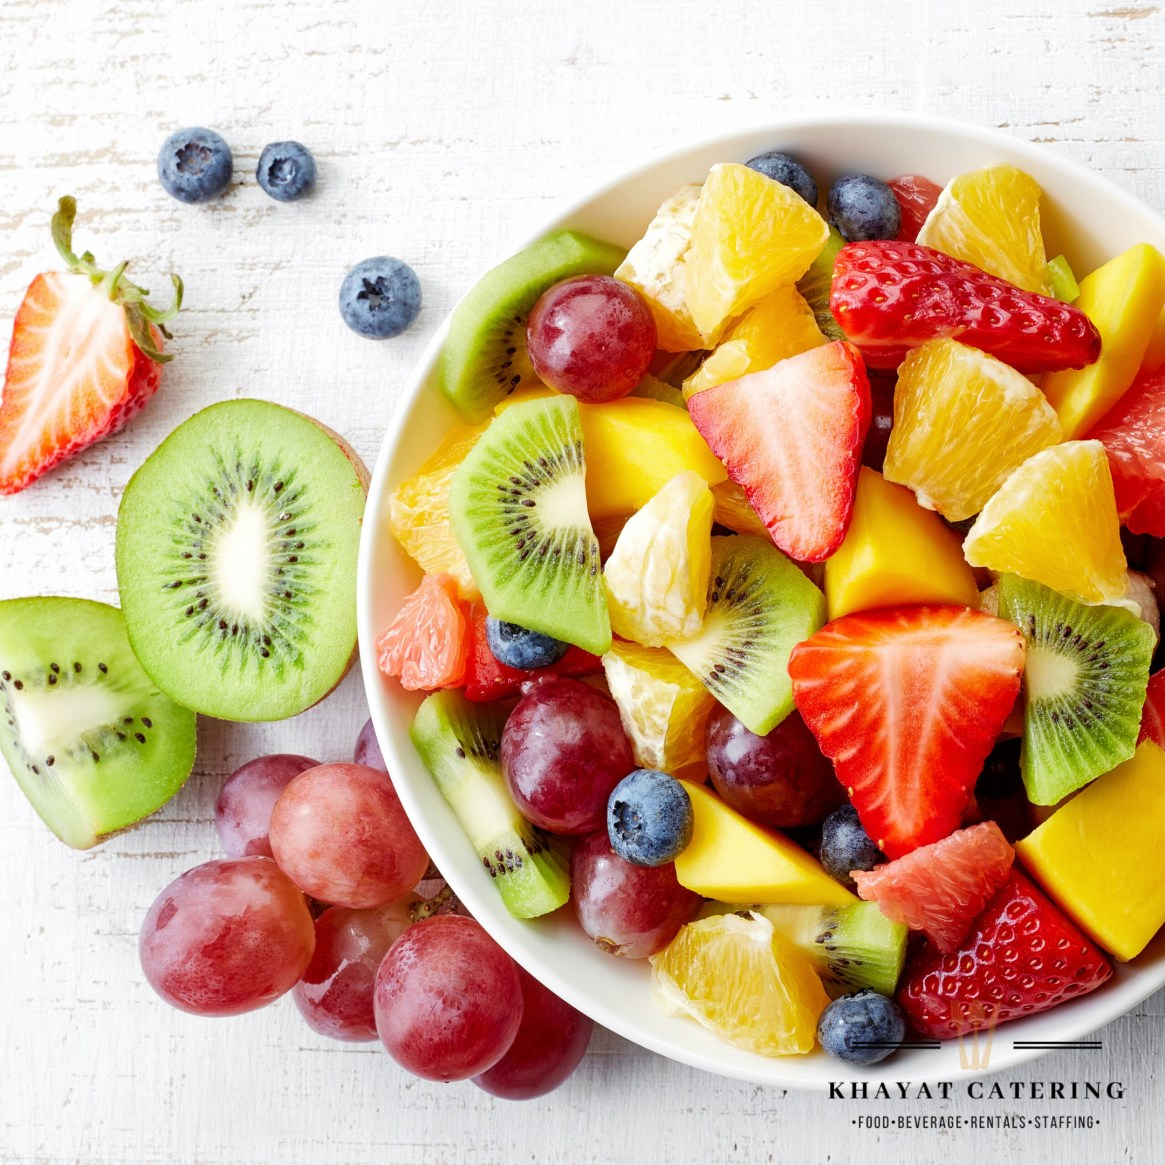 Khayat Catering fruit salad